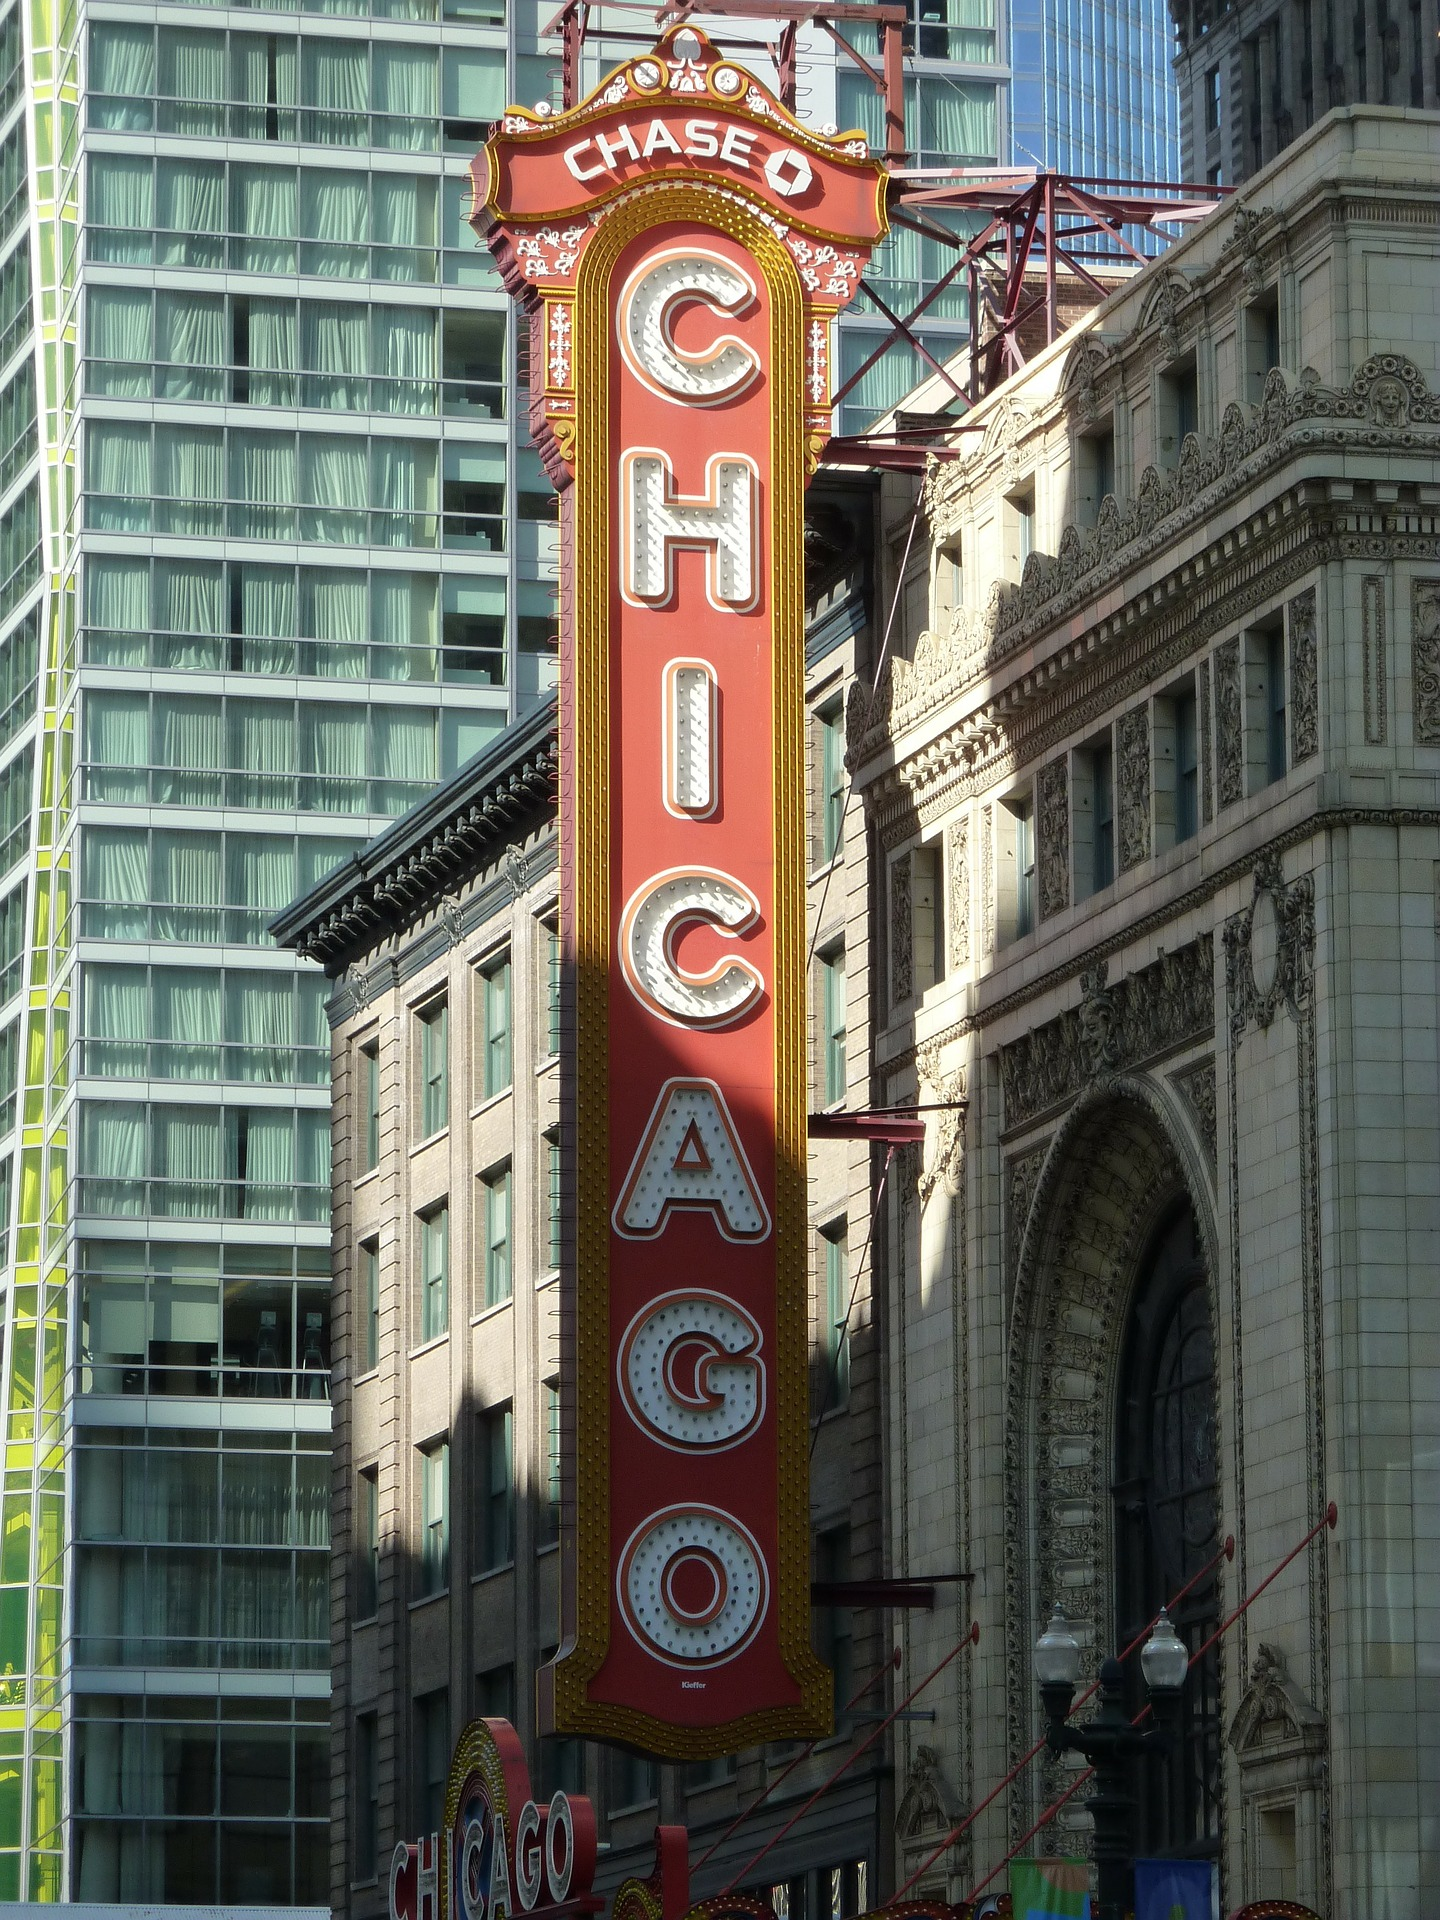 chicago-199870_1920